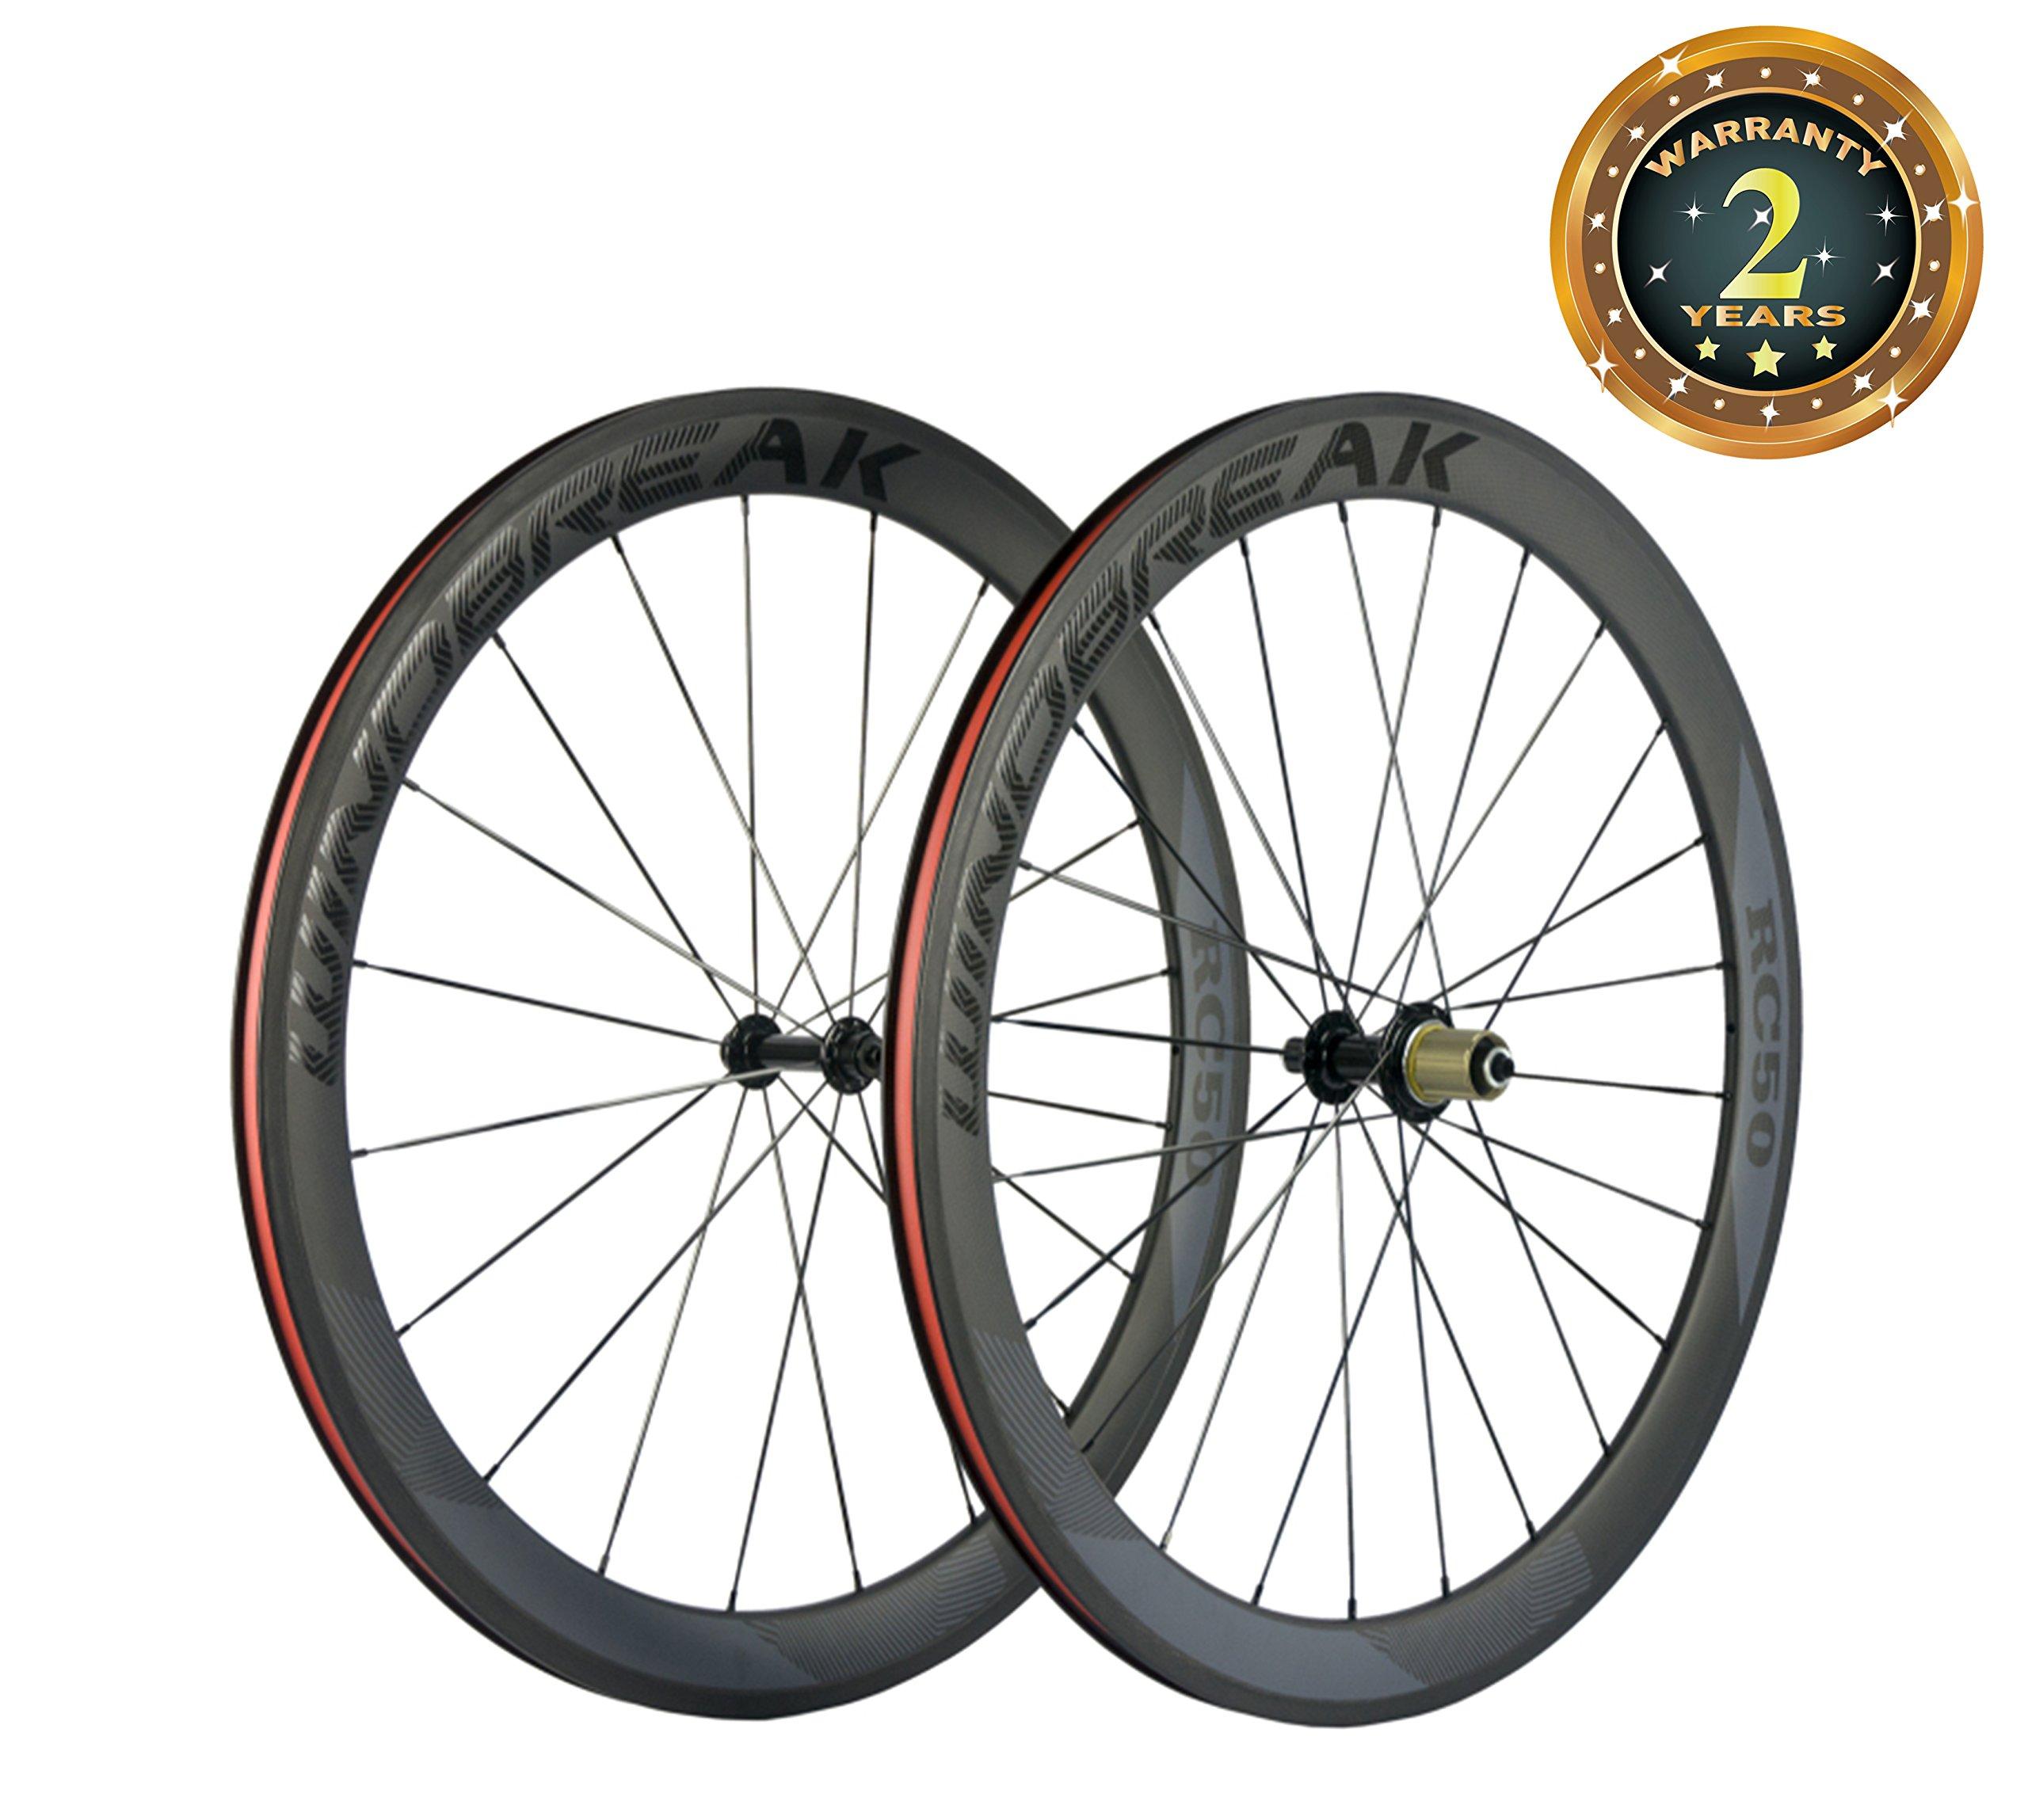 Sunrise Bike Carbon Road Wheels 700C 50mm Clincher Wheelset 3k Matte Finish with Decal